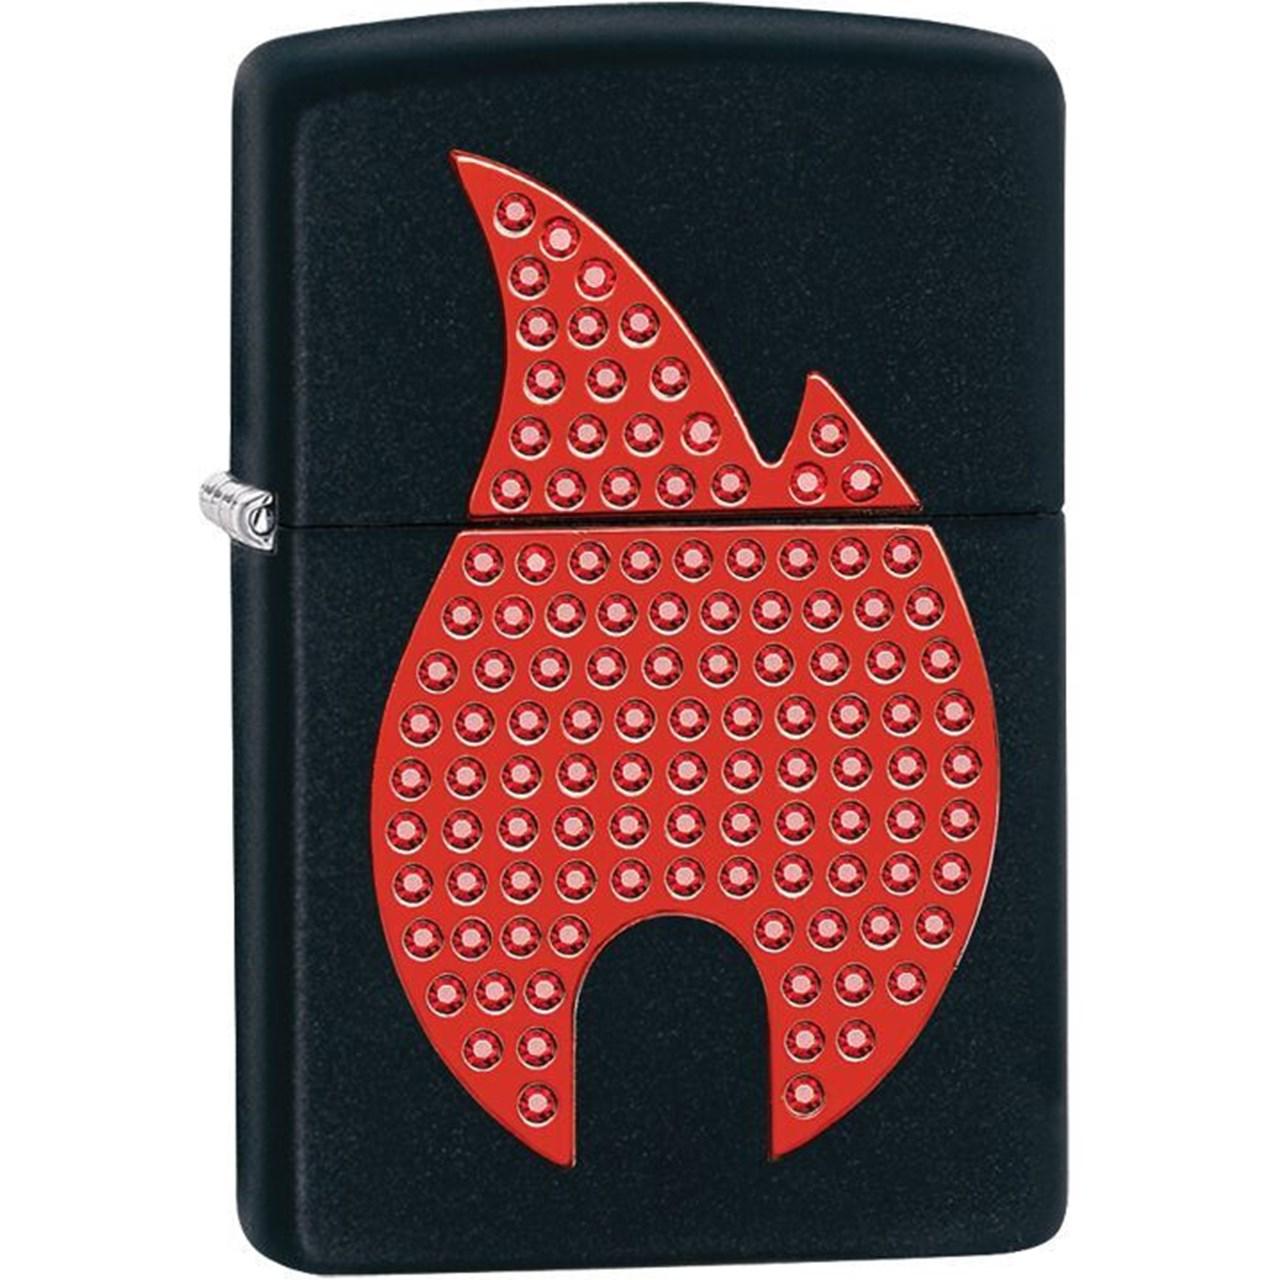 فندک زیپو مدل Bling Zippo Flame Black Matte کد 29106